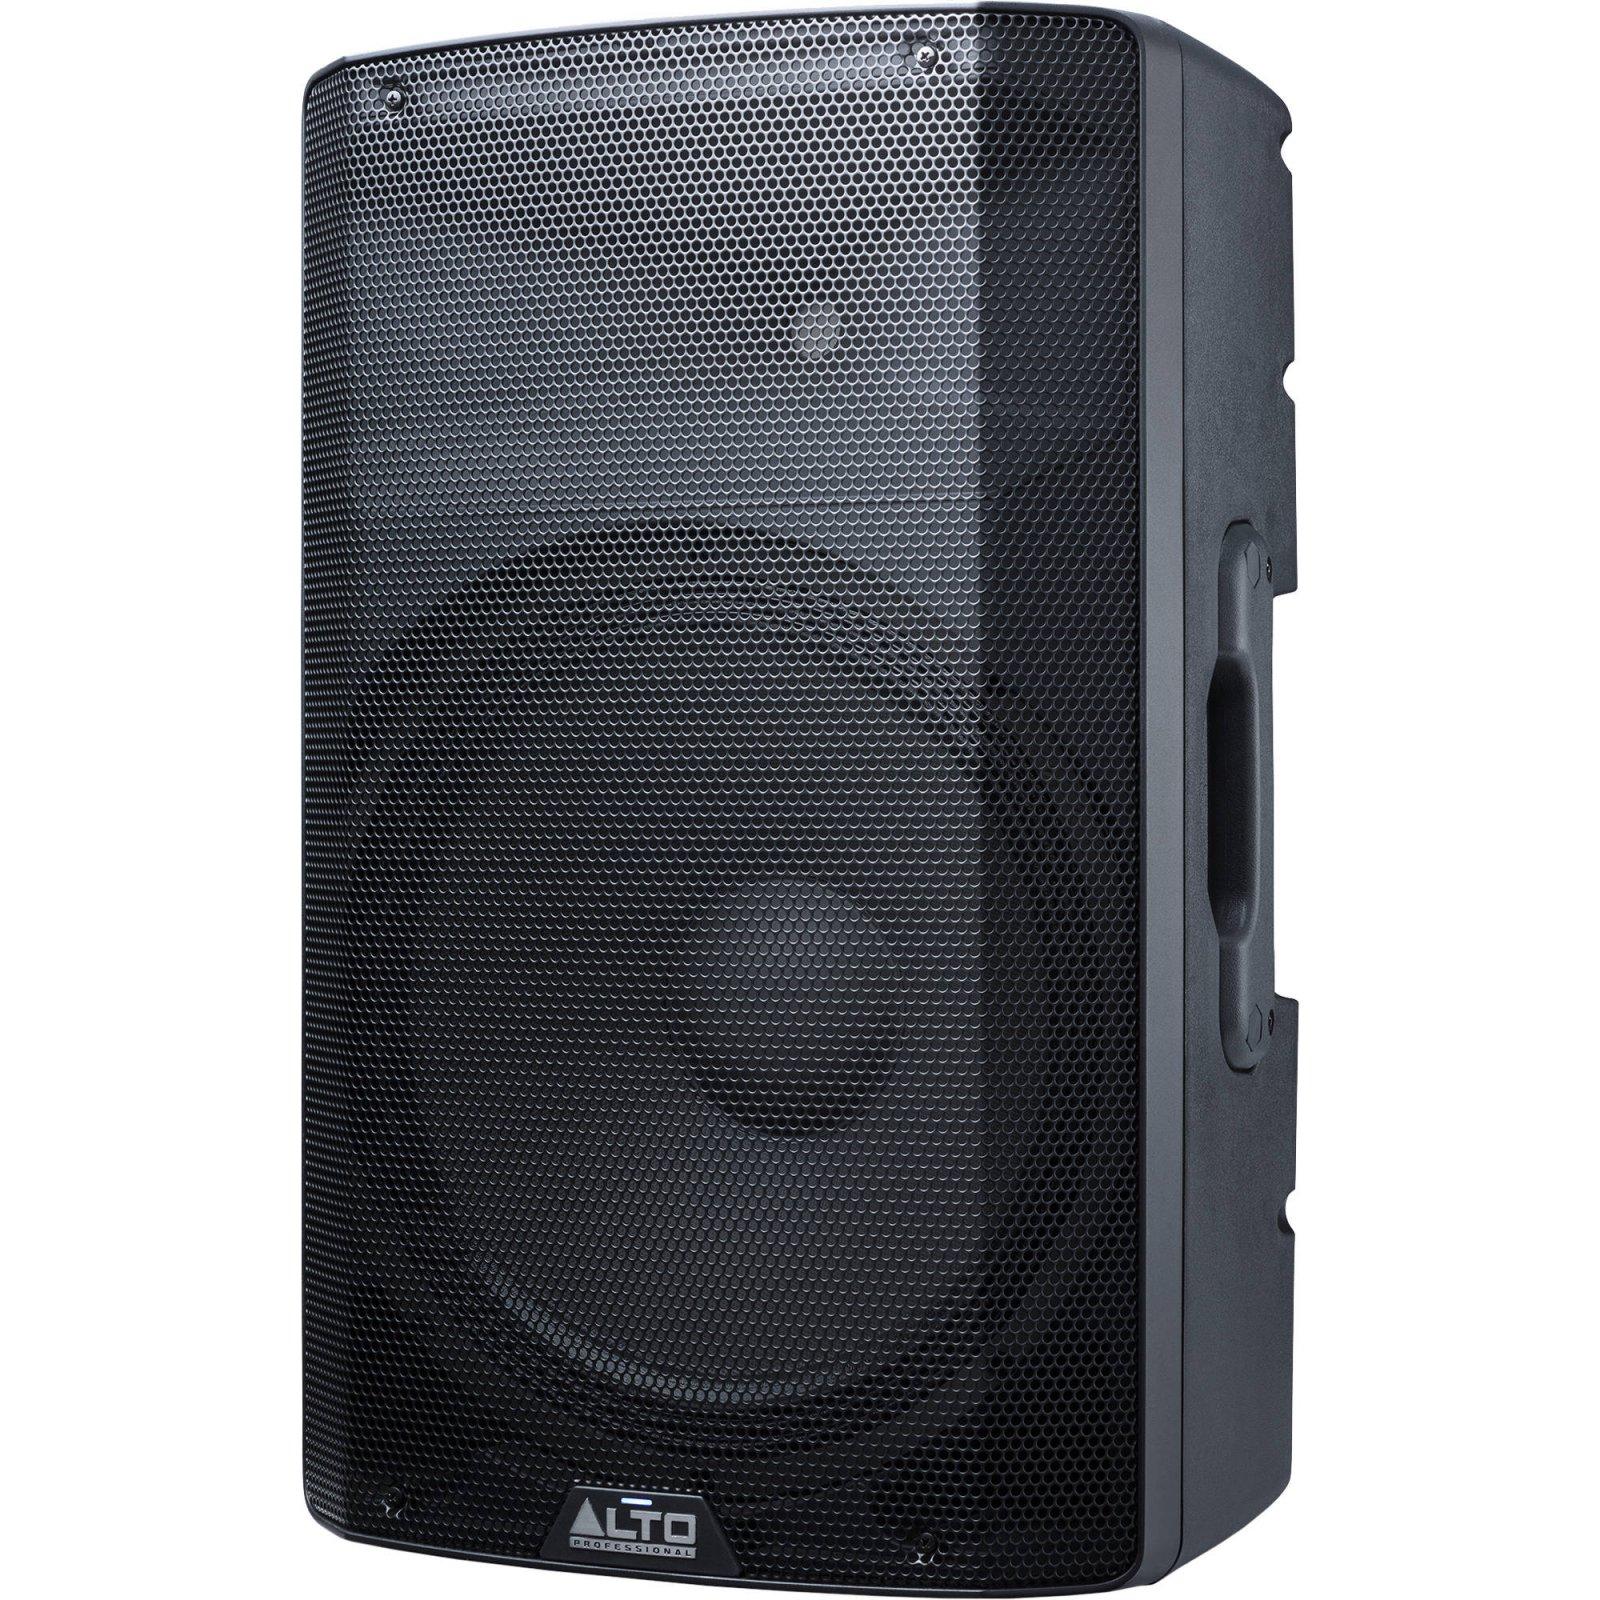 ALTO TX215 600W POWERED SPEAKER